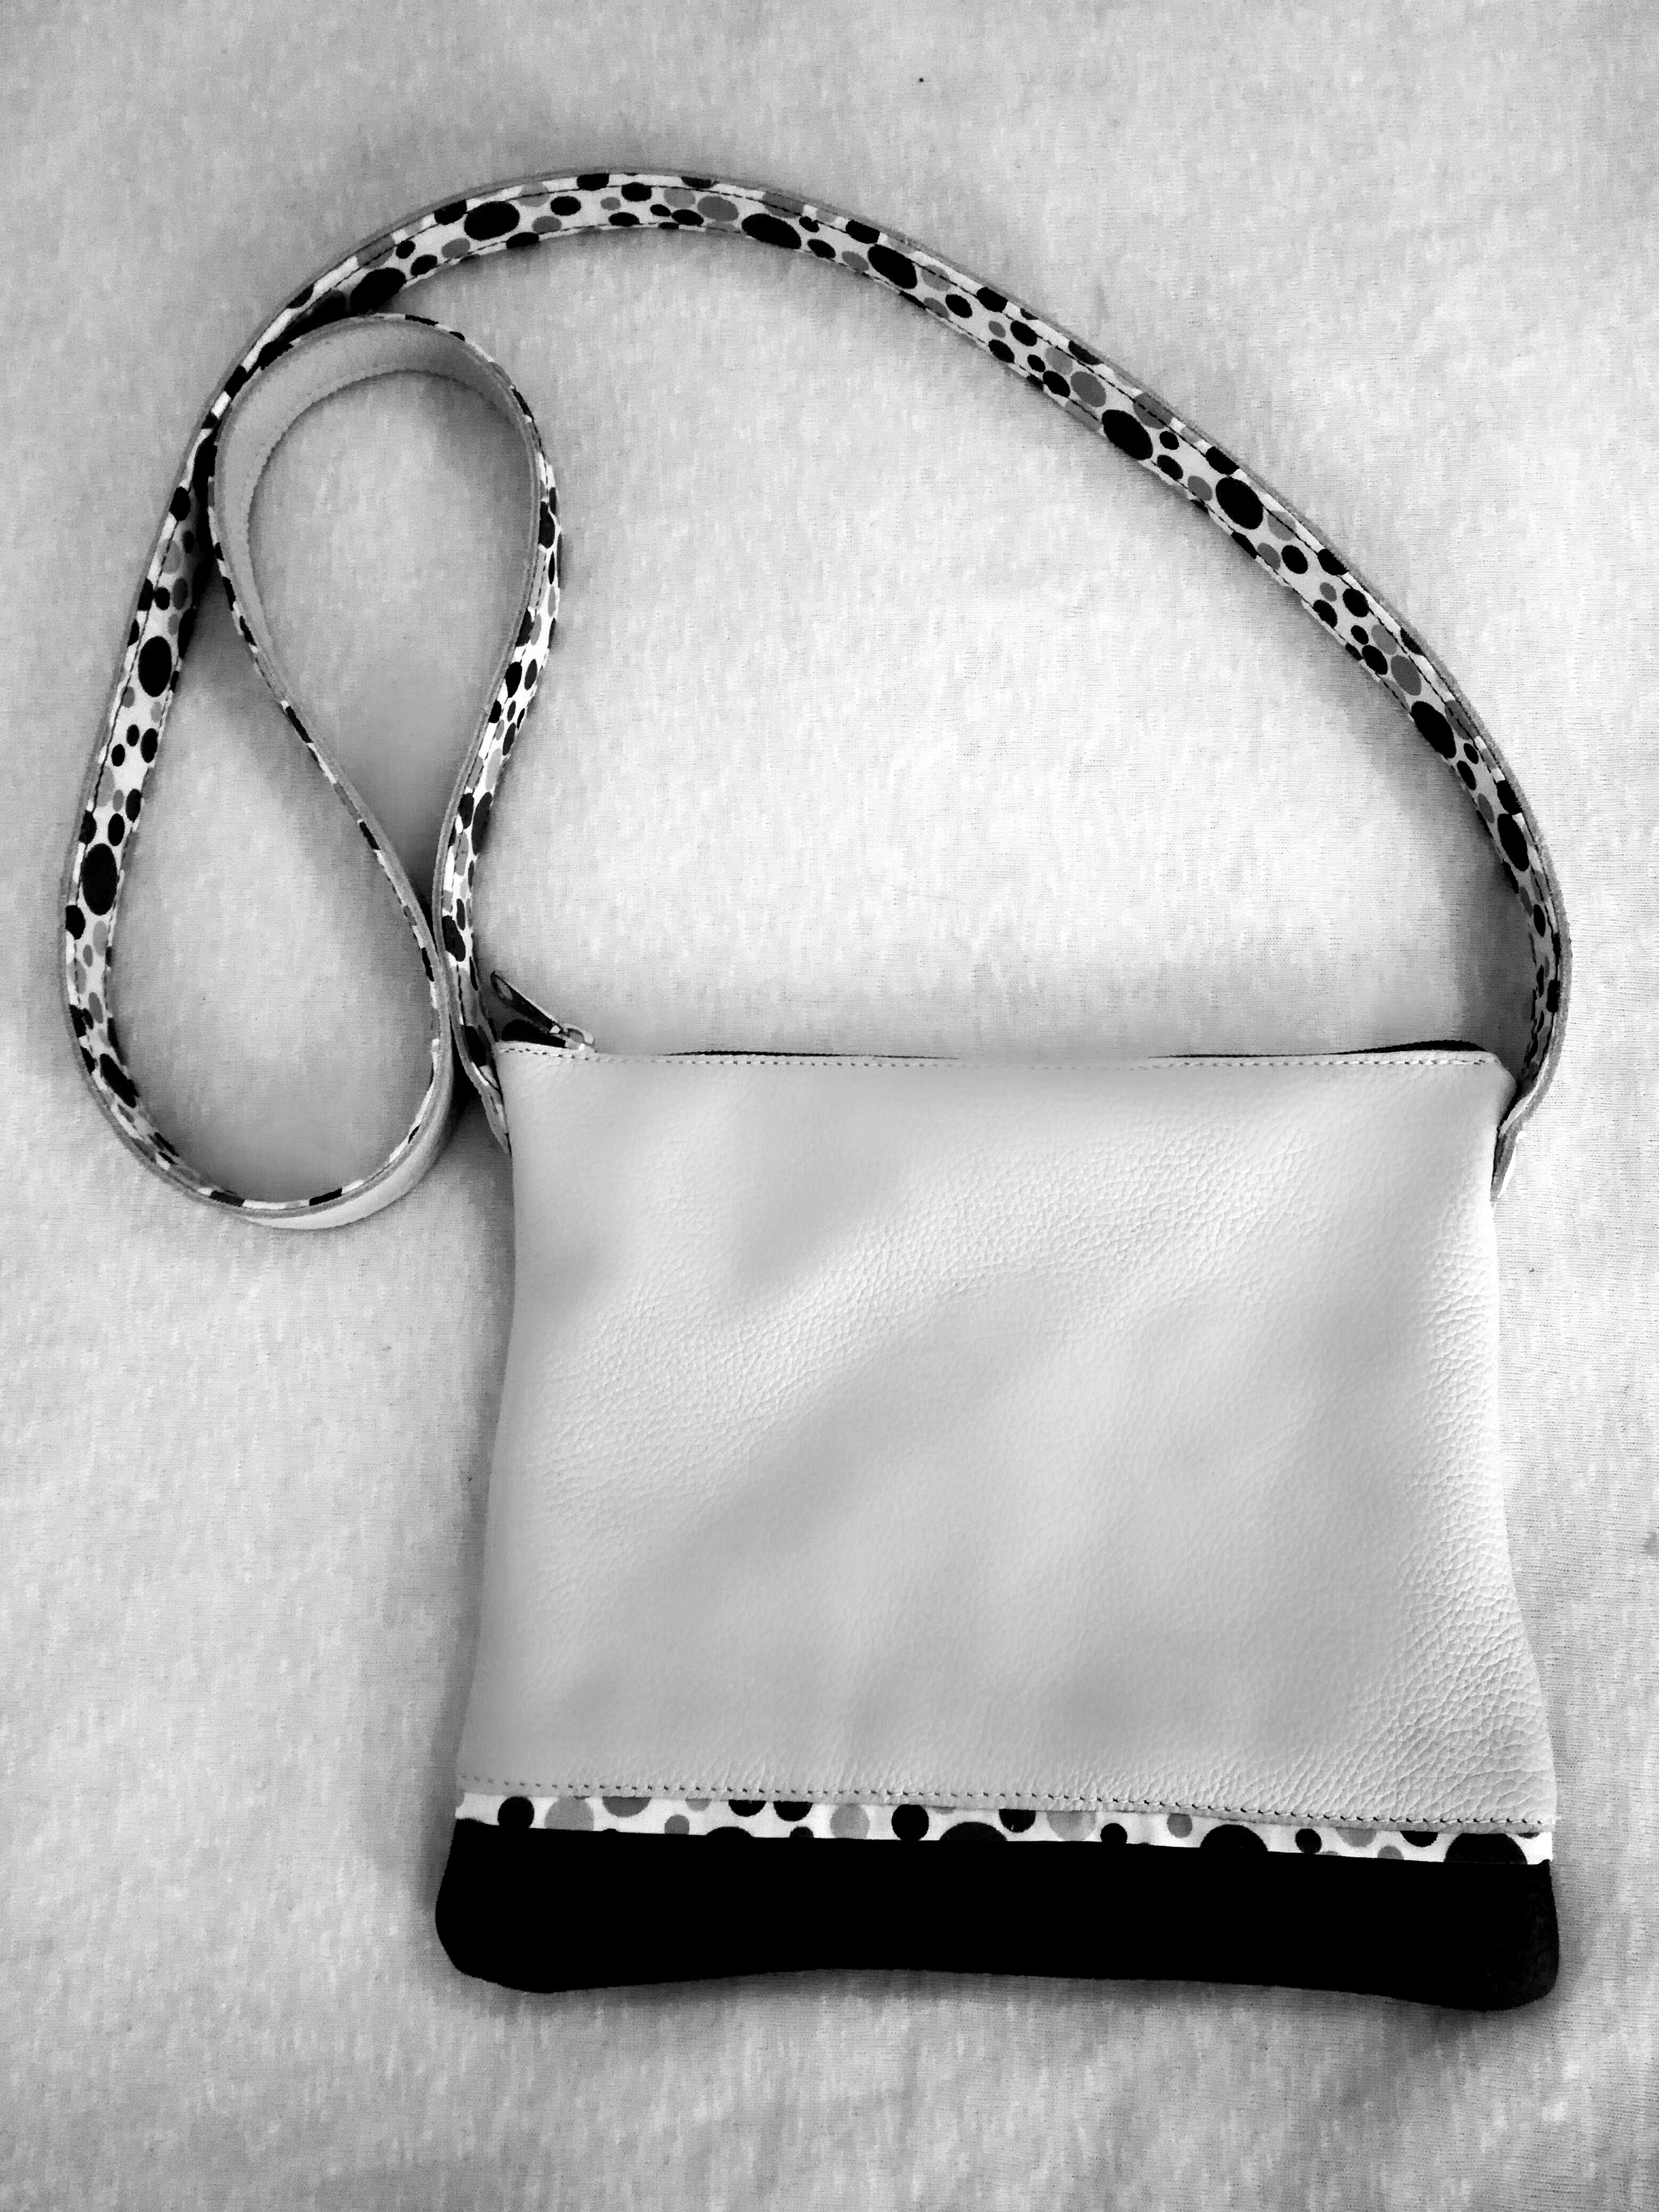 Belladonna créations sac à main cuir